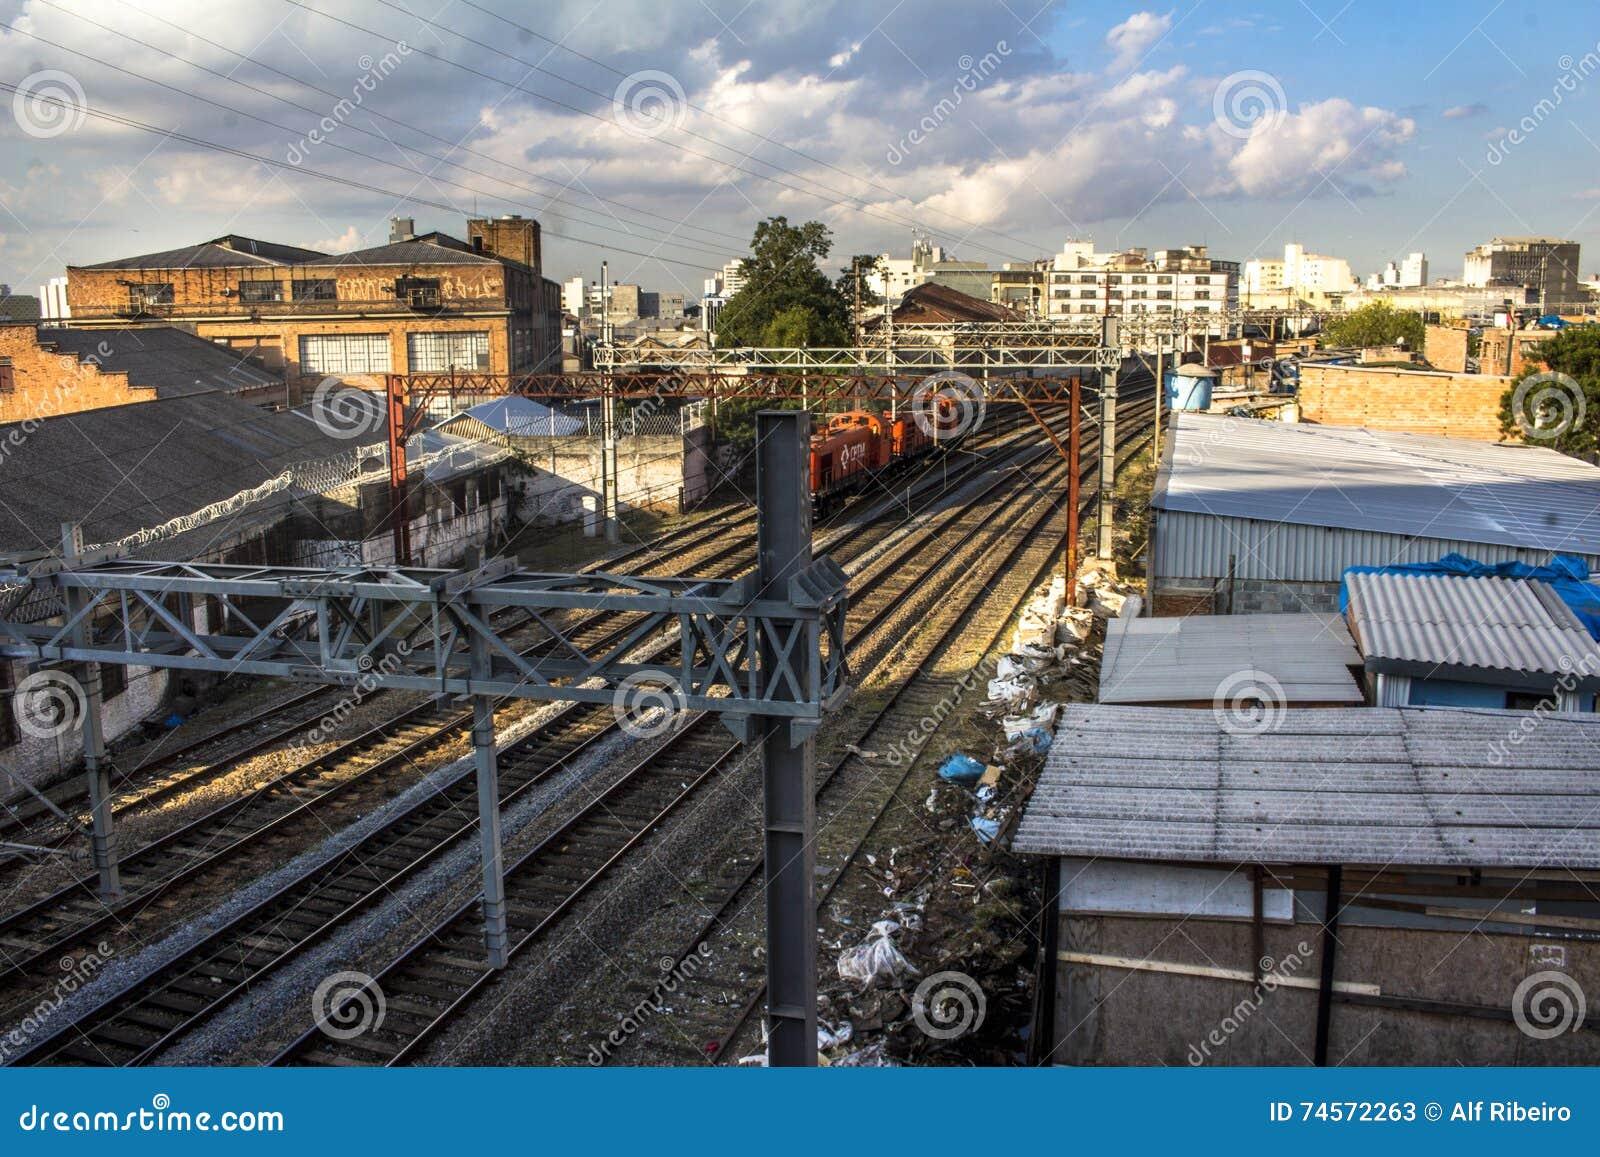 Slum of Moinho